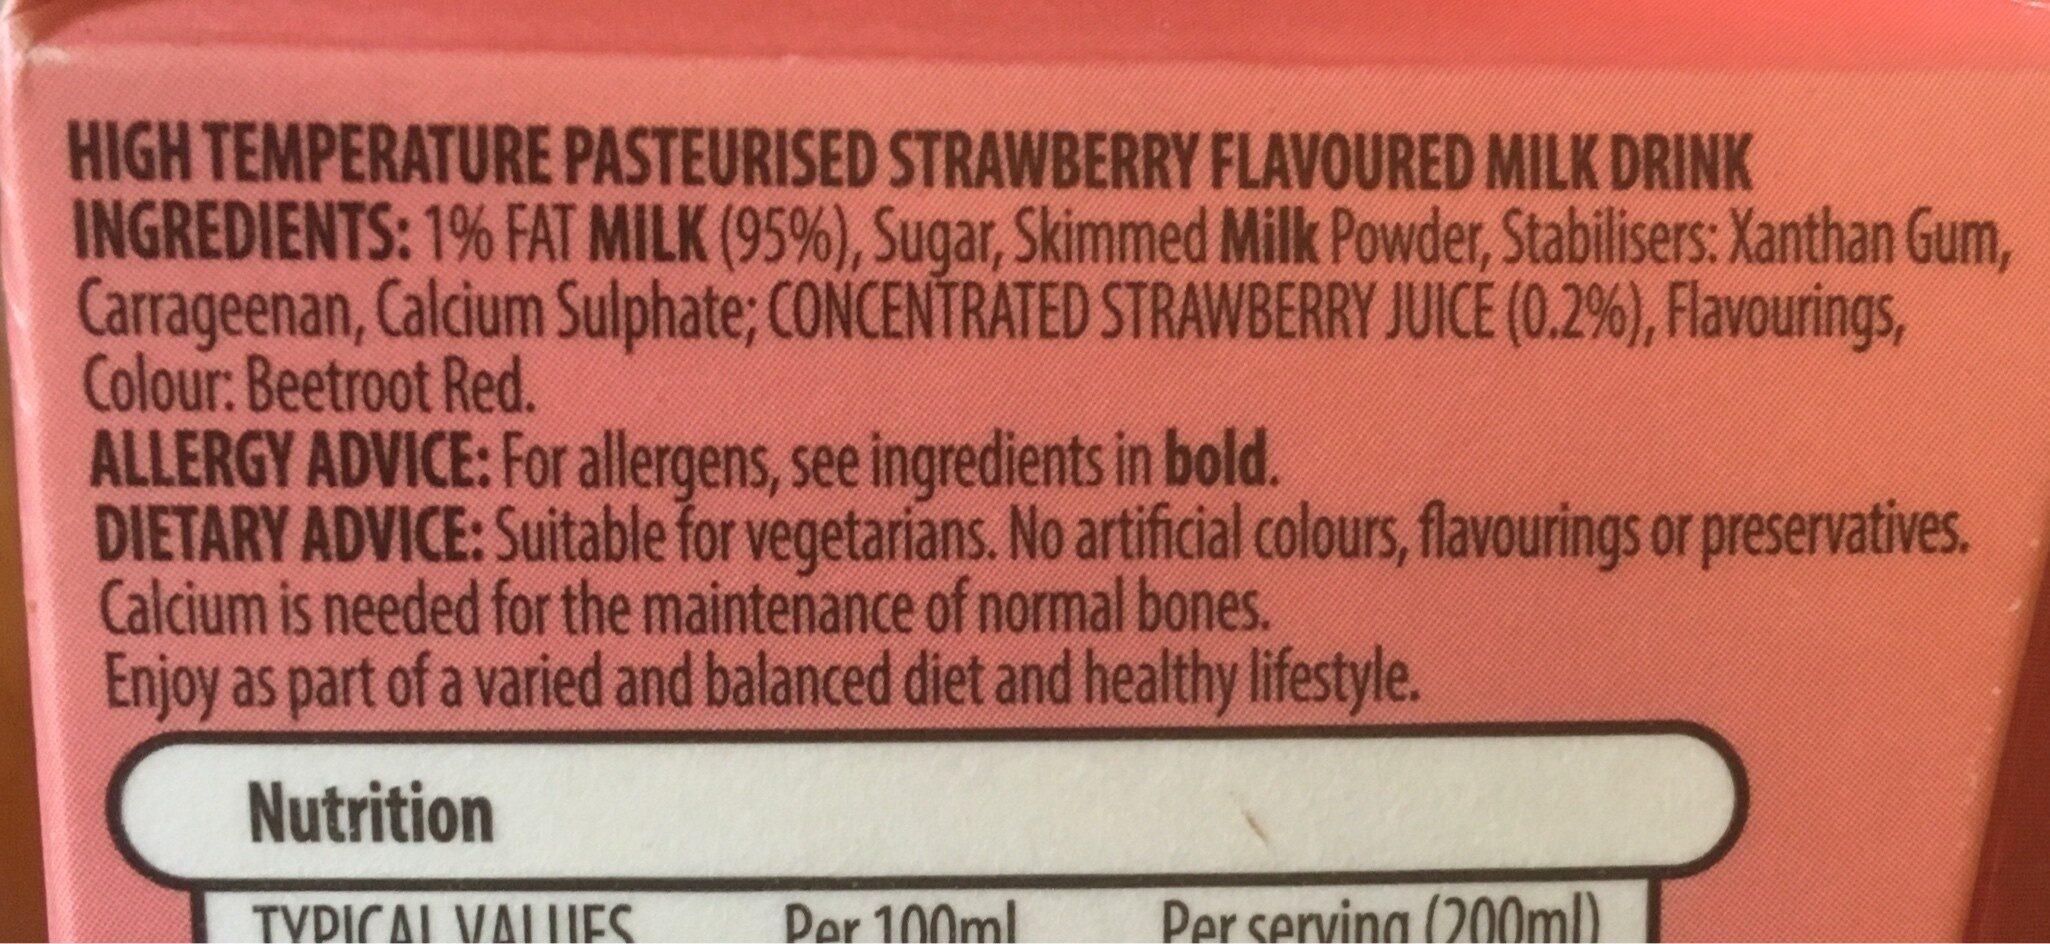 Strawberry flavoured milk - Ingredients - en